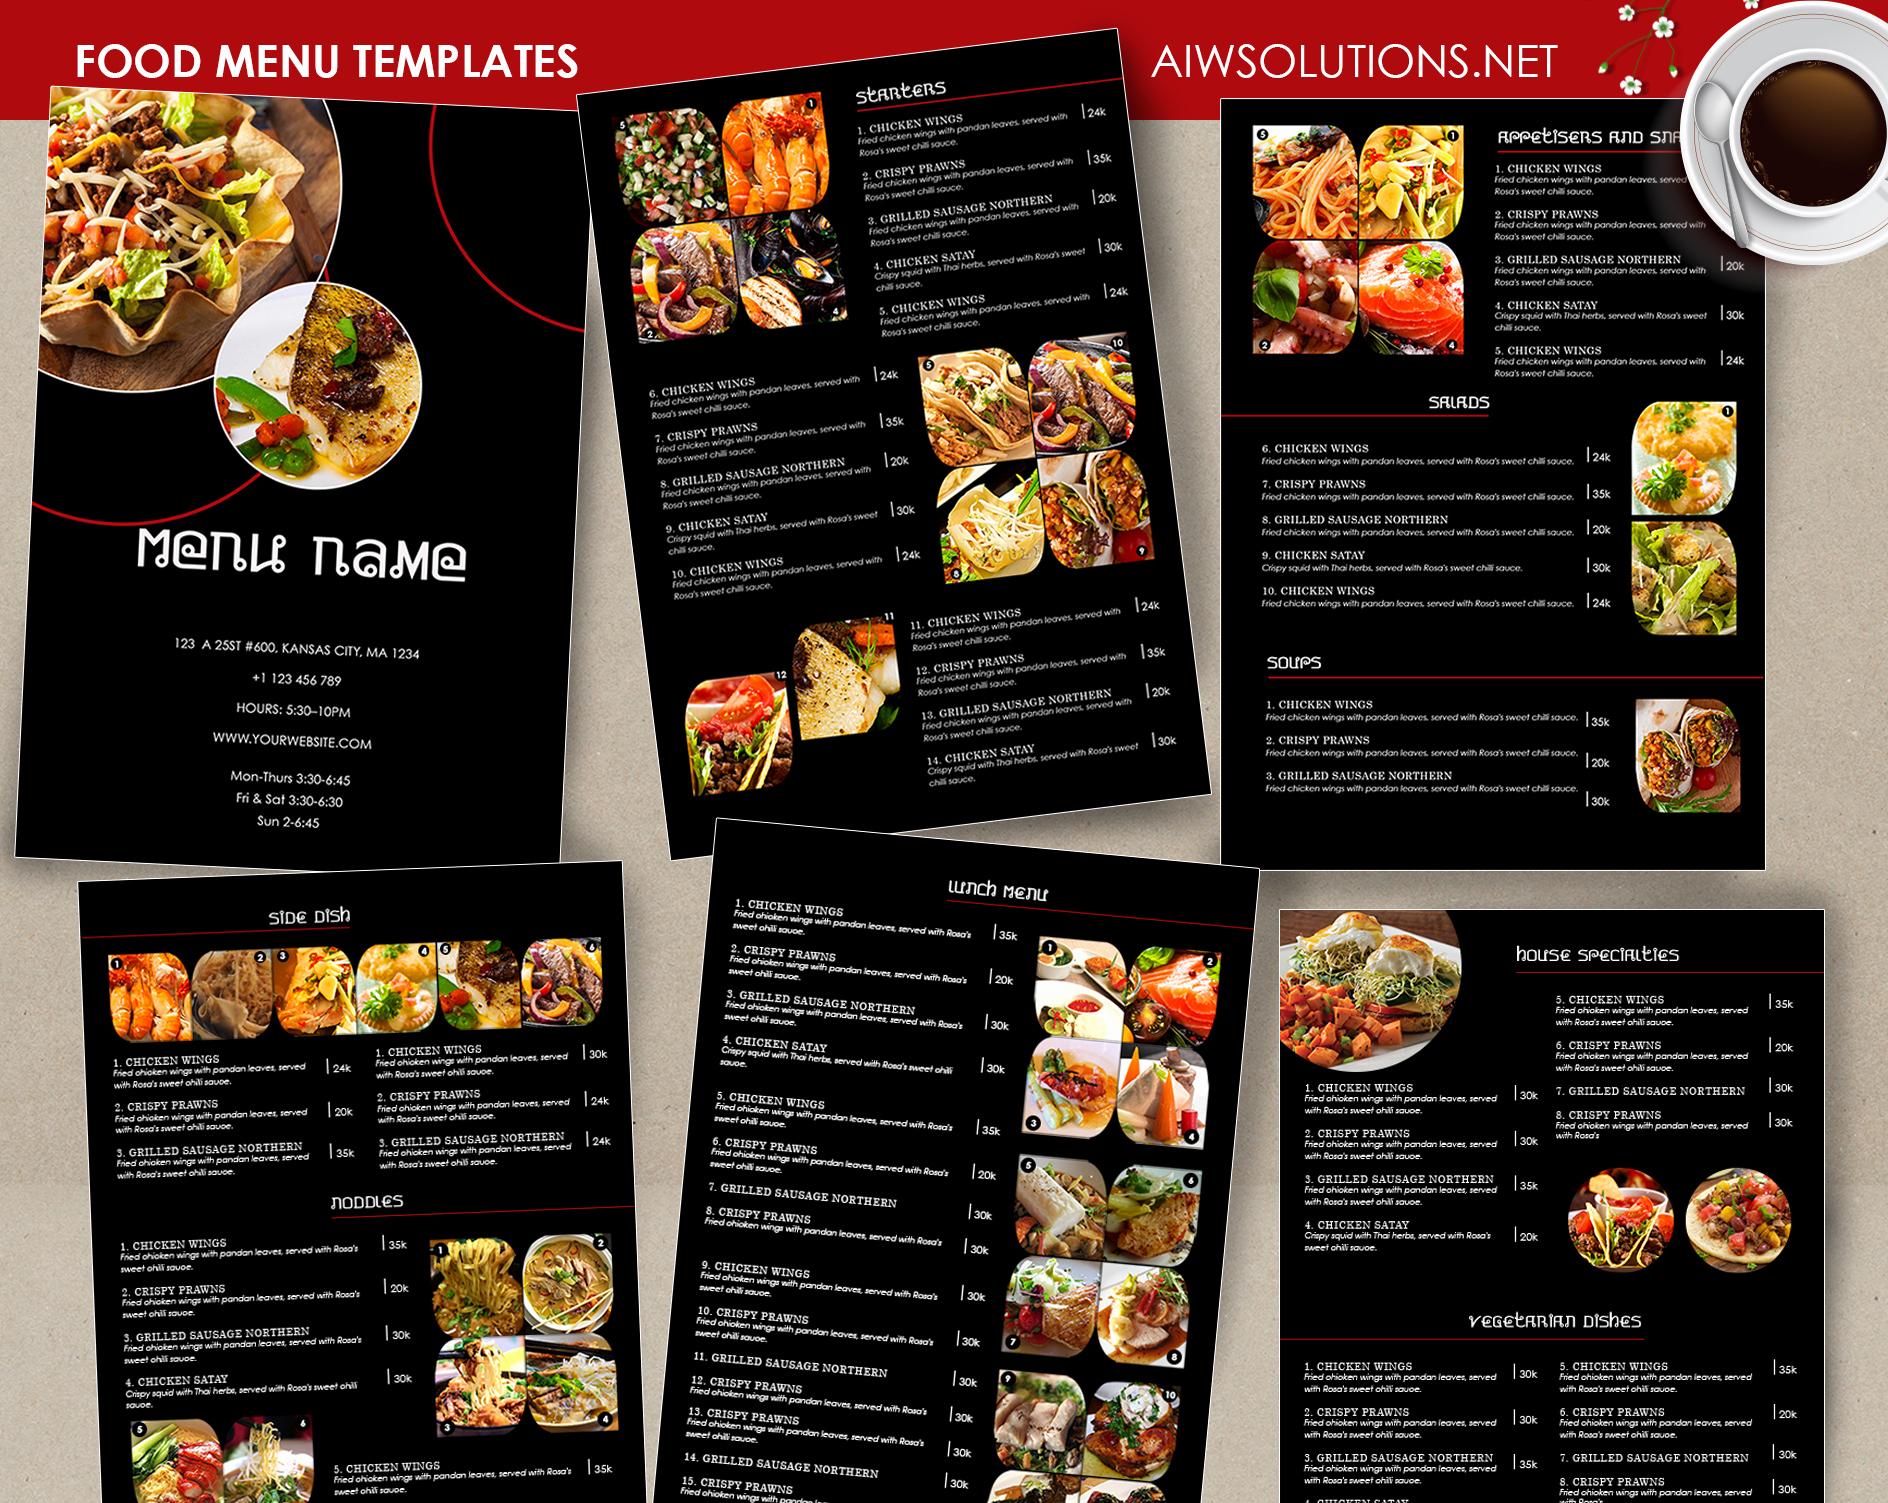 Free Online Menu Templates Best Of Design & Templates Menu Templates Wedding Menu Food